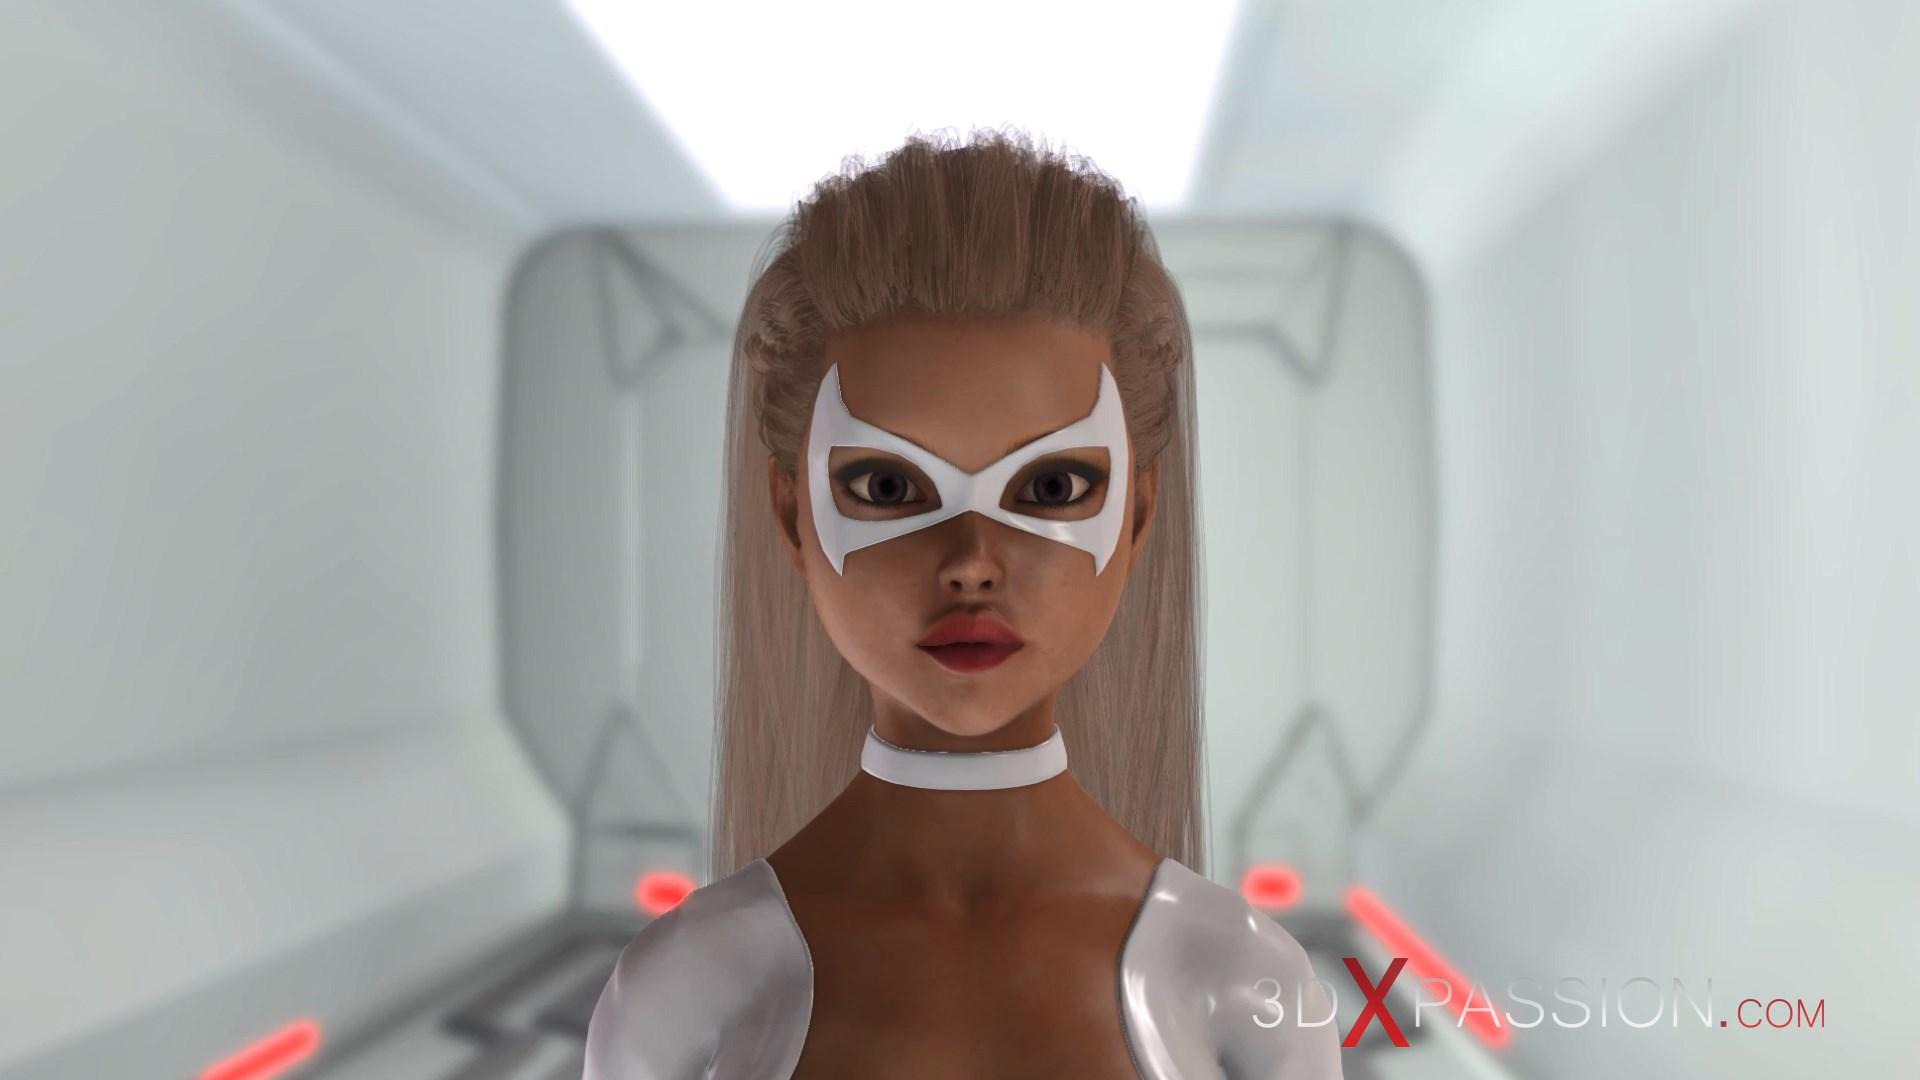 3d alien dickgirl space station